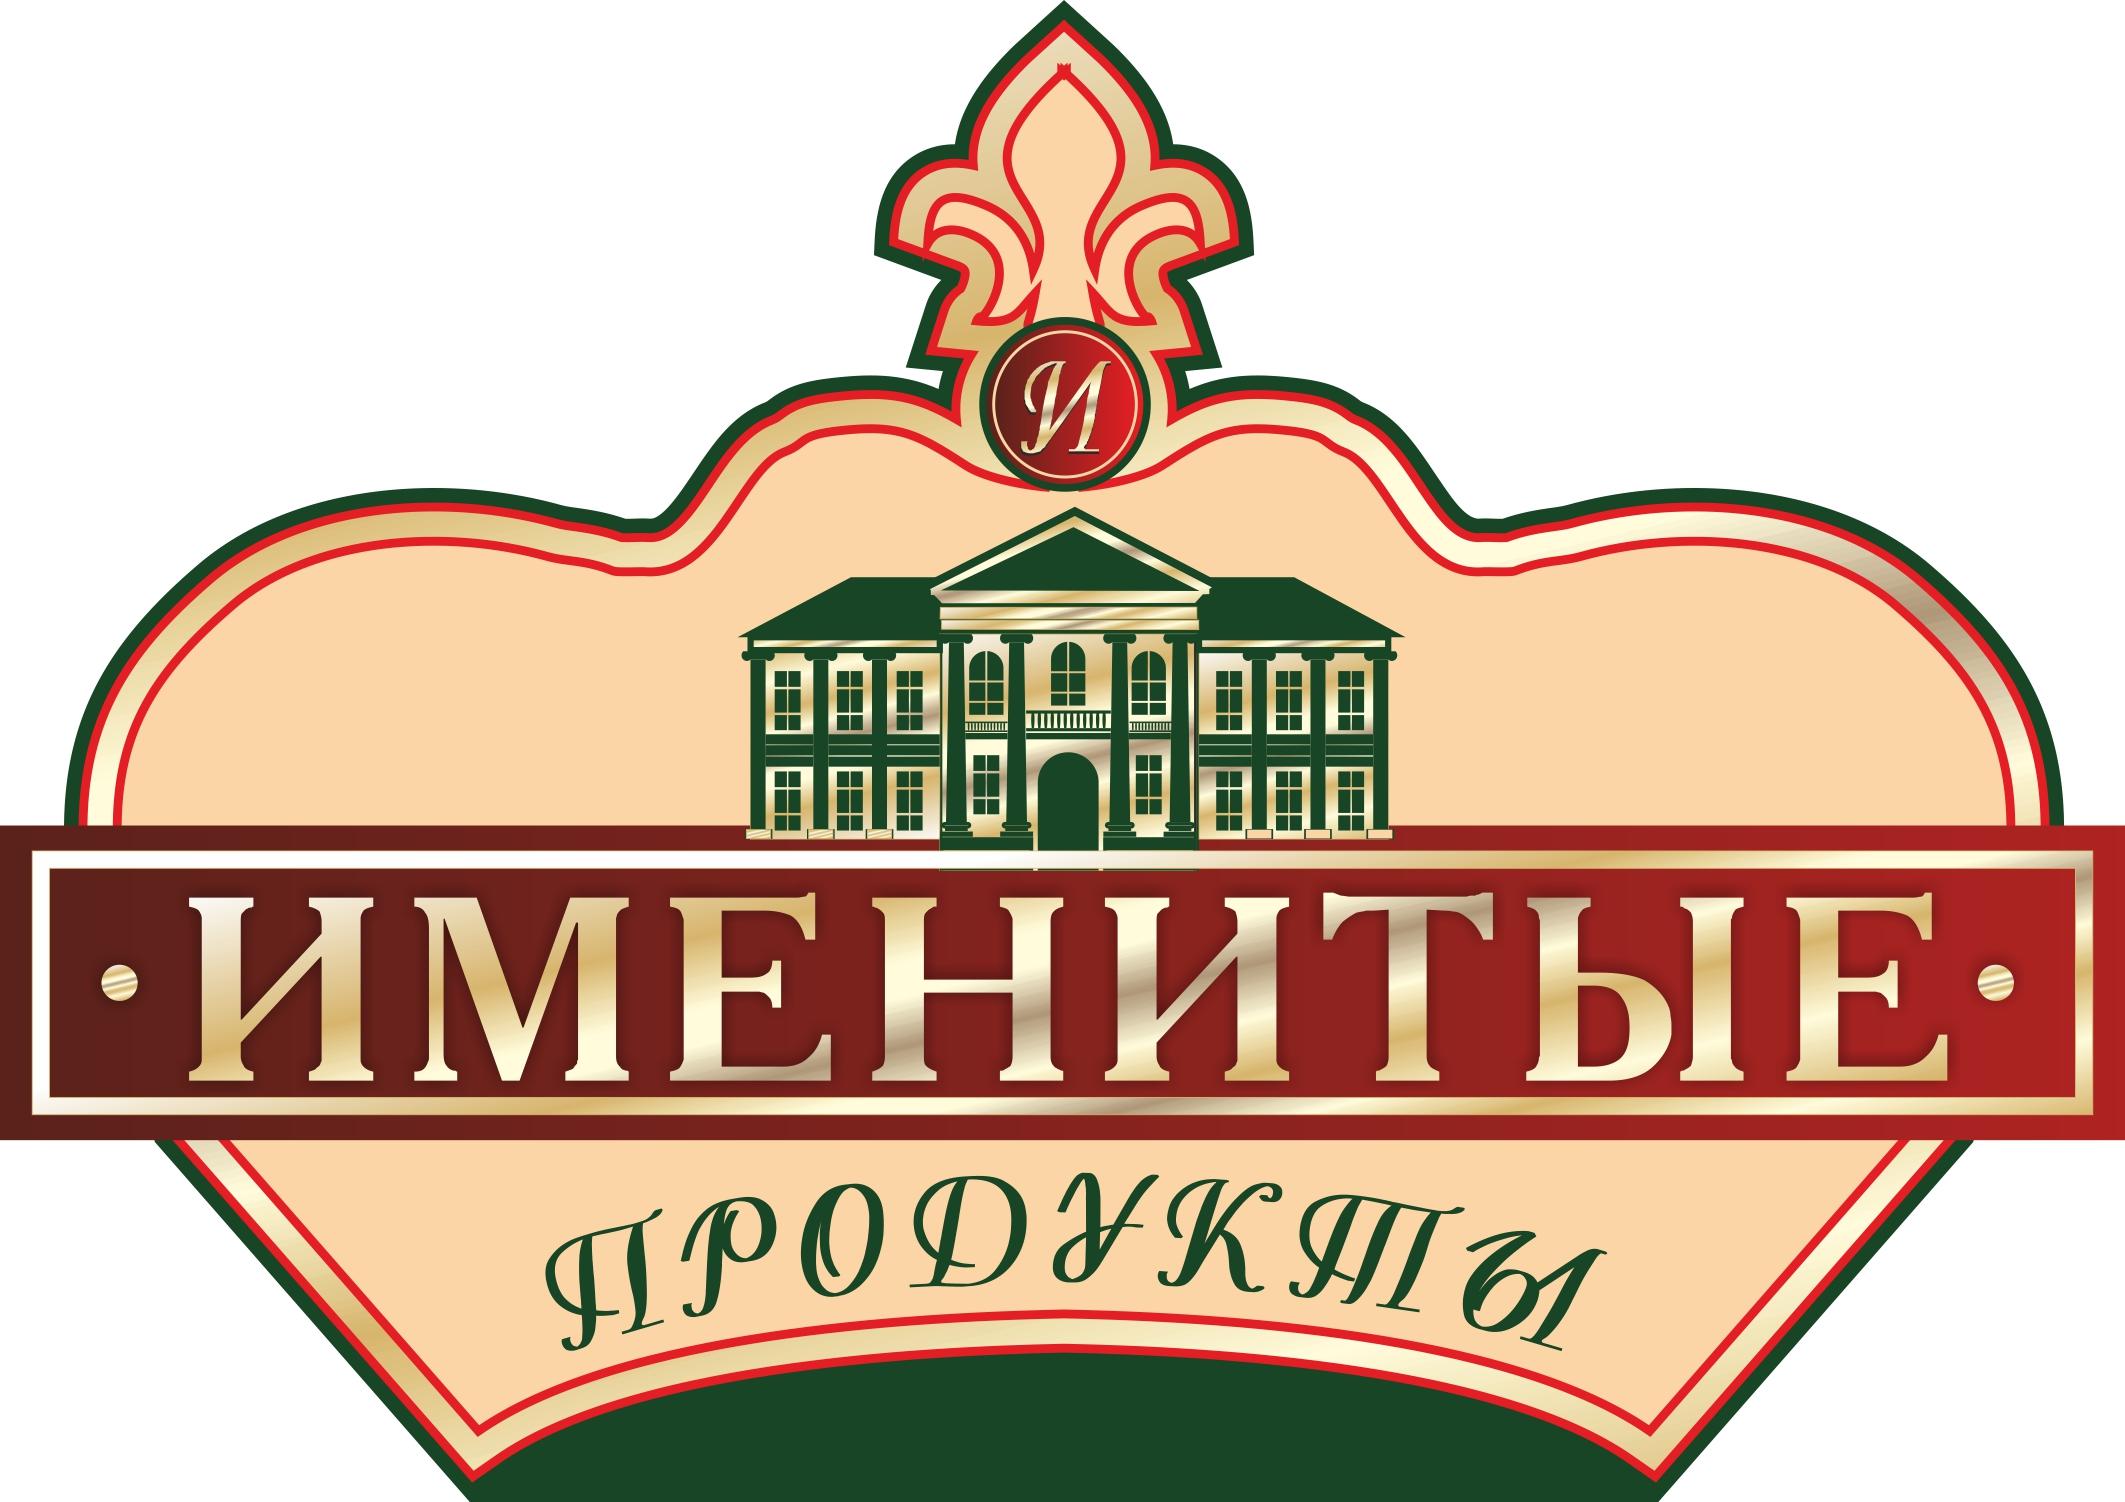 Логотип и фирменный стиль продуктов питания фото f_8345bb7551f51e53.jpg